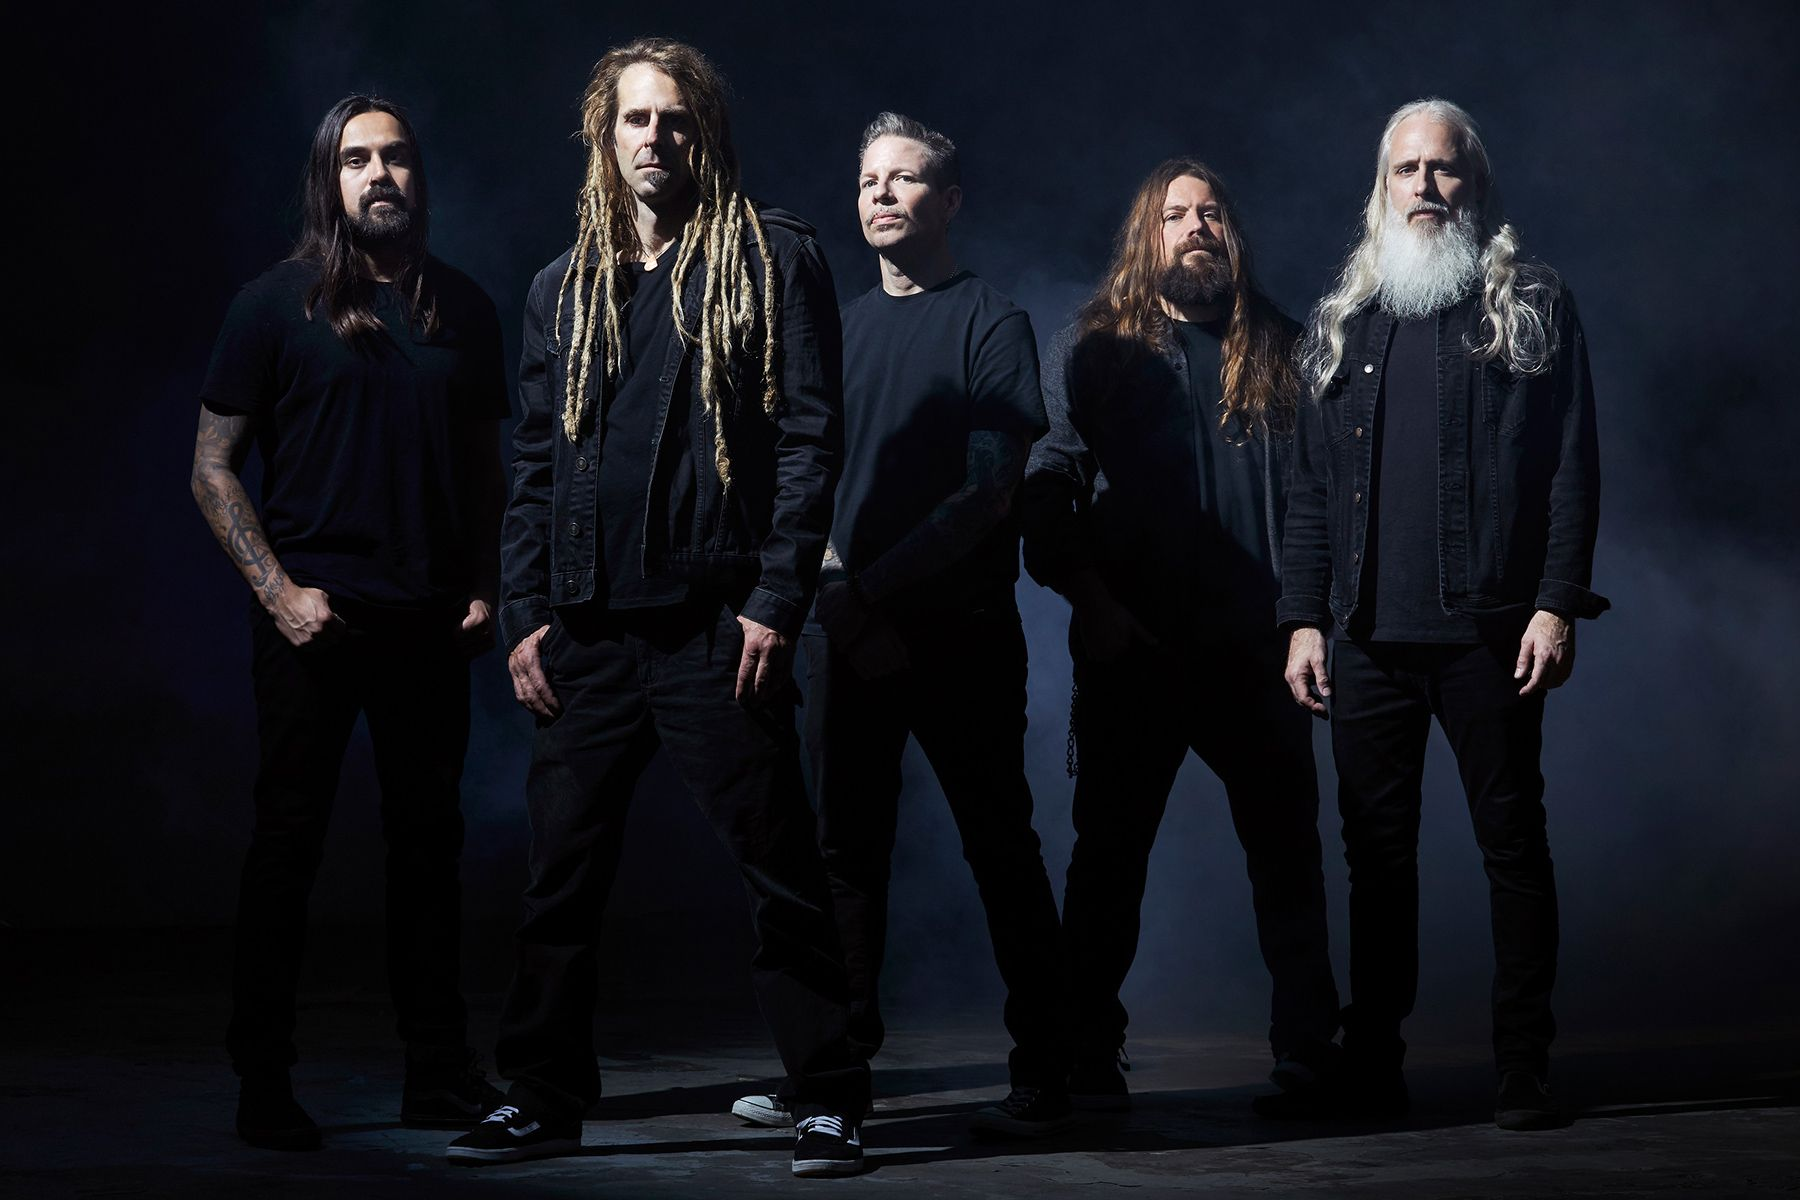 Lamb of God Embody 'The American Scream' on SelfTitled